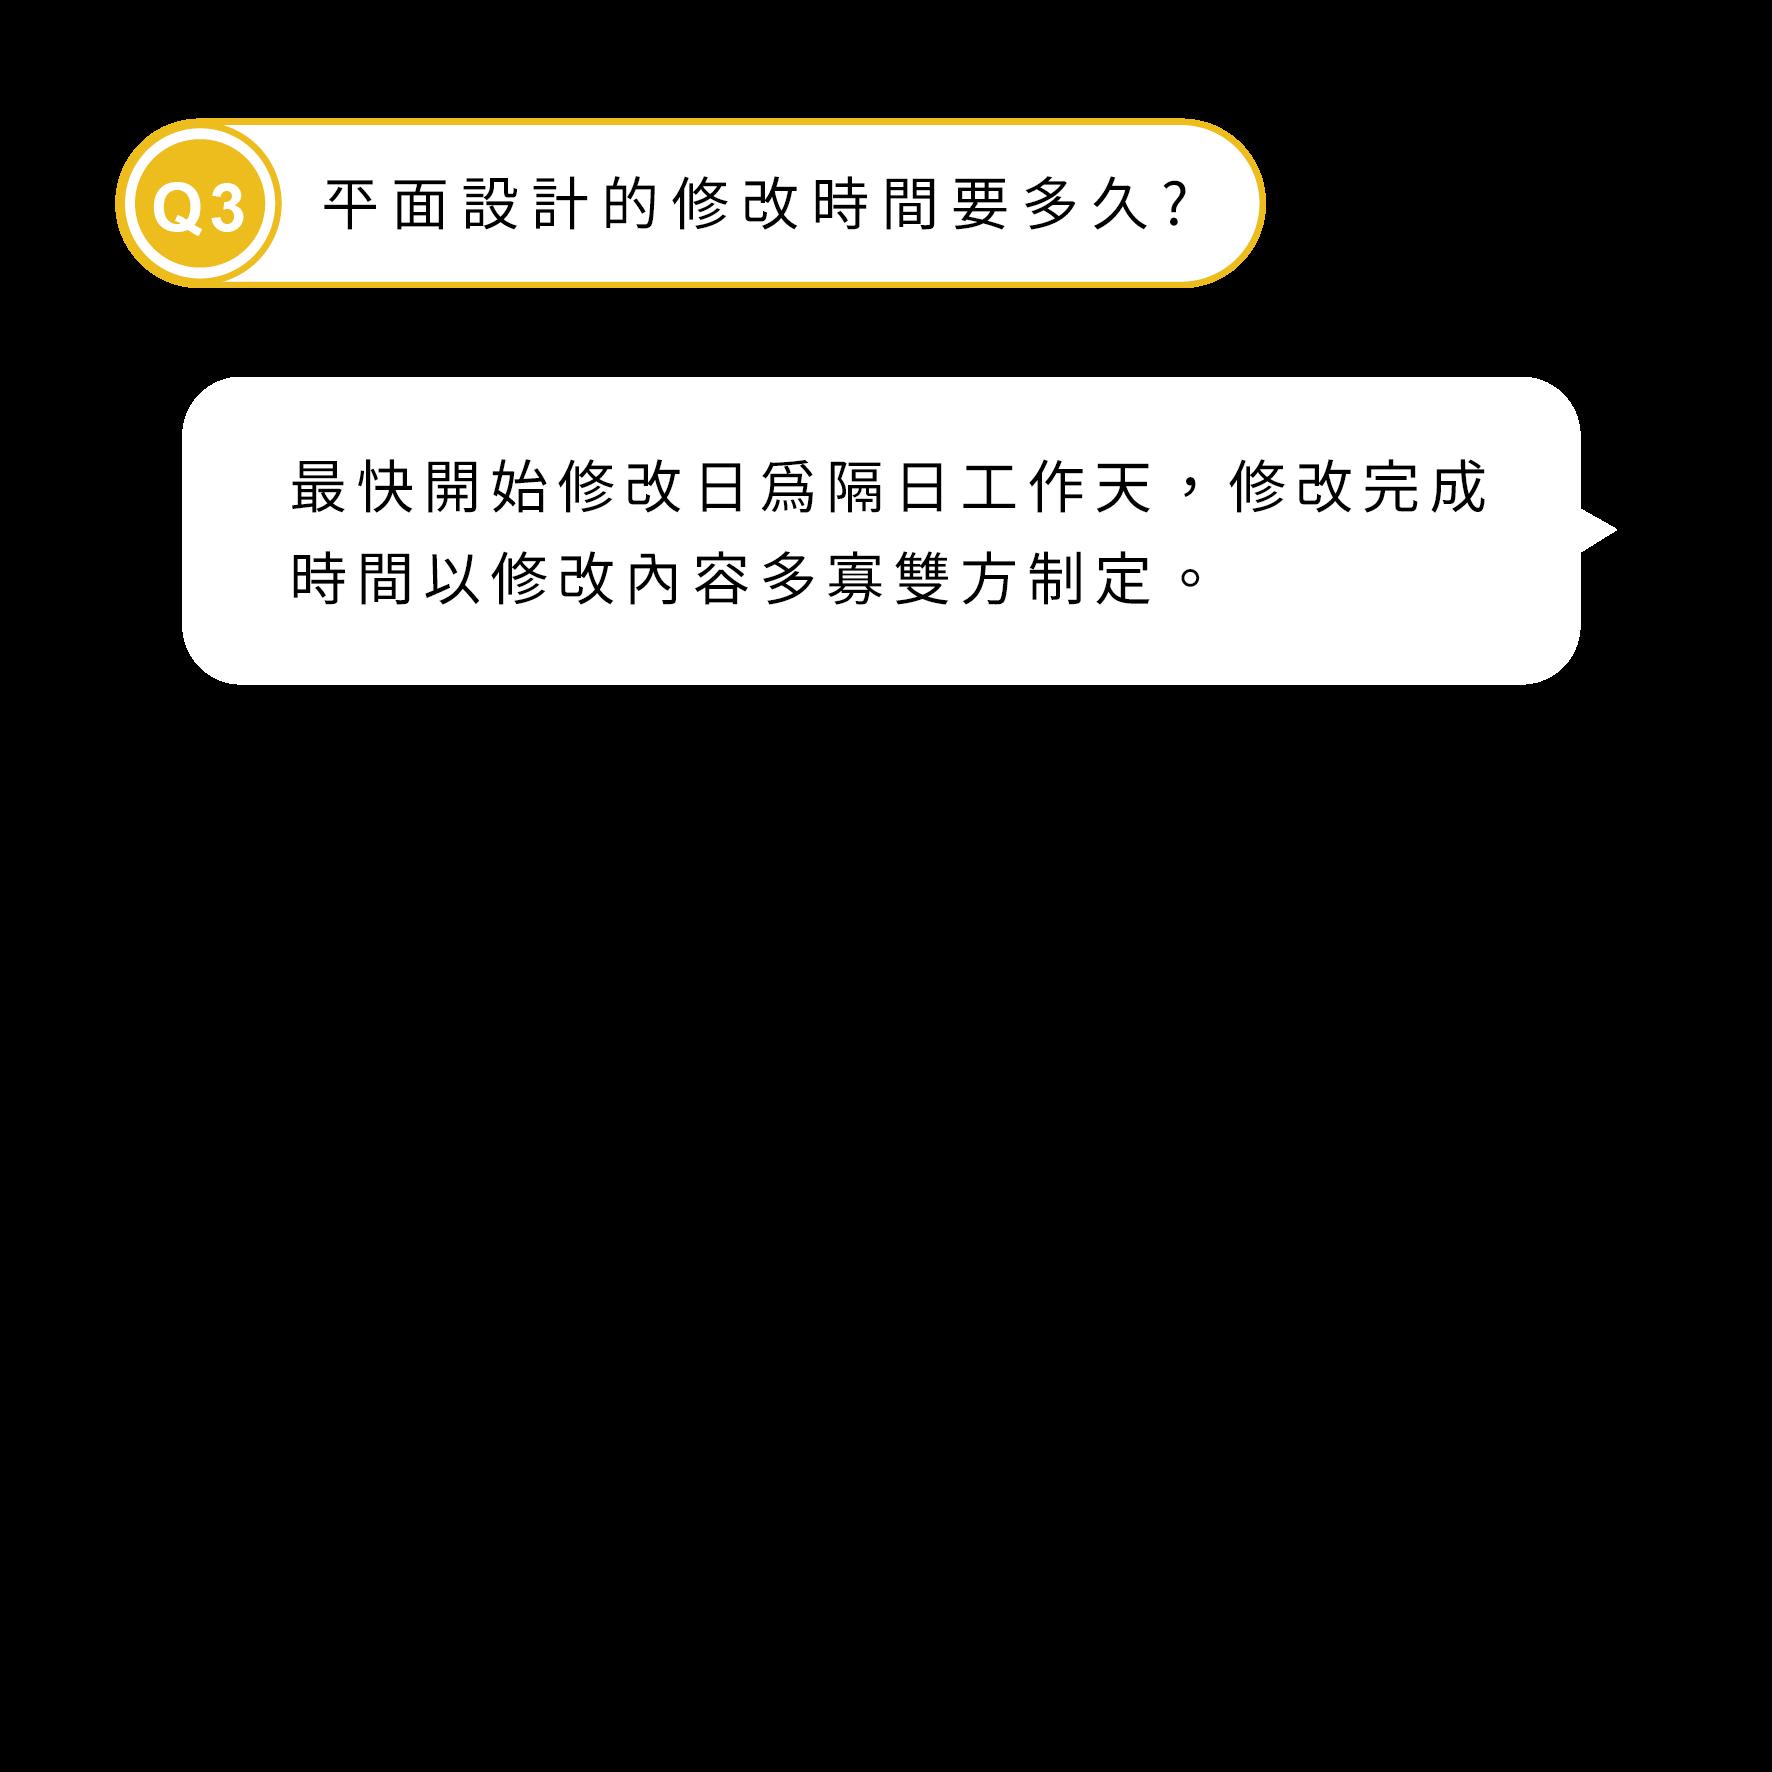 Q3-11